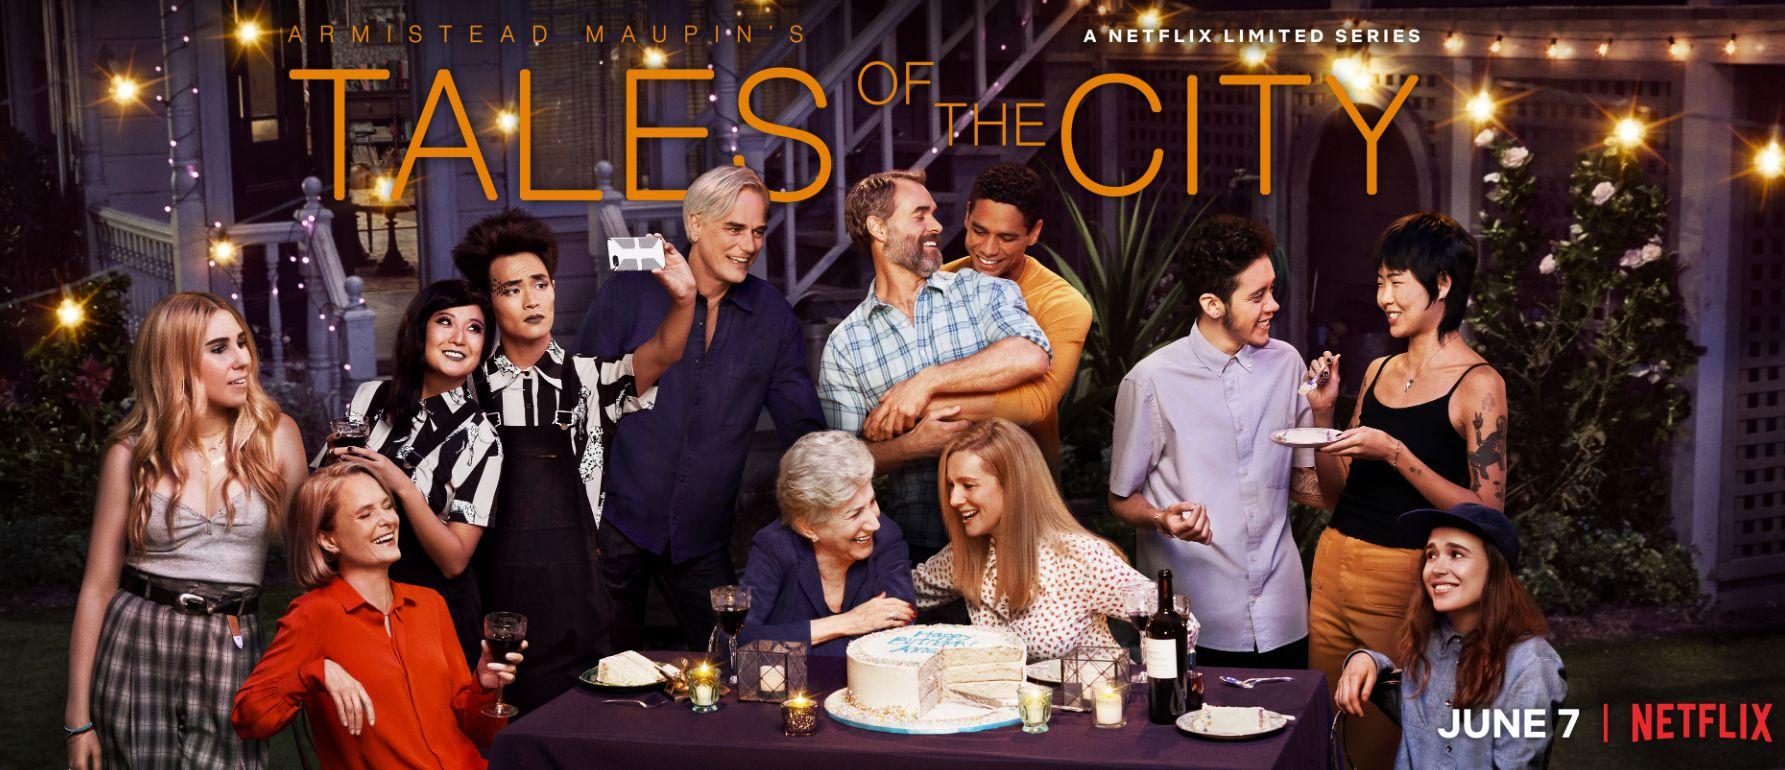 Netflix Drops 'Tales of the City' Sequel Trailer: WATCH